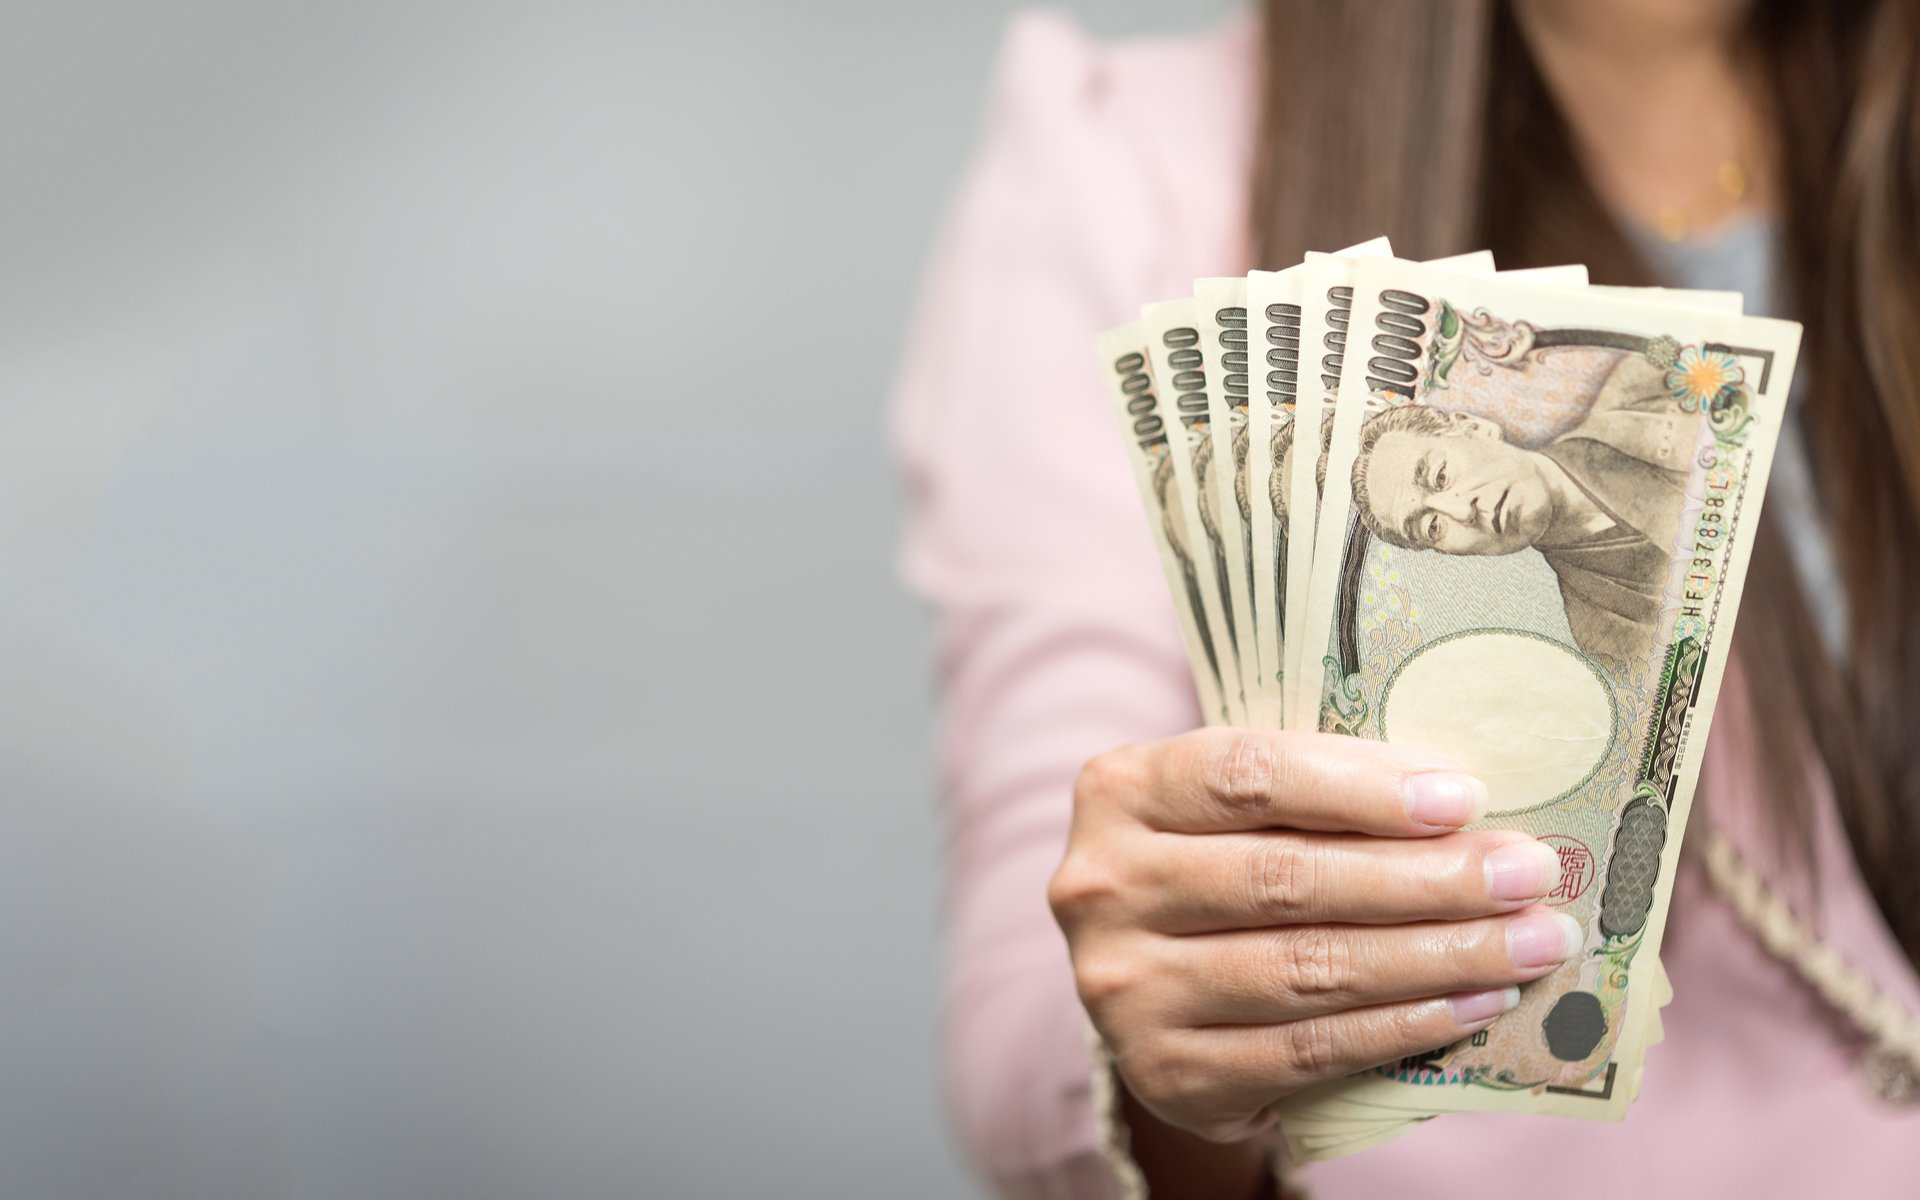 Coincheck reimburses customers